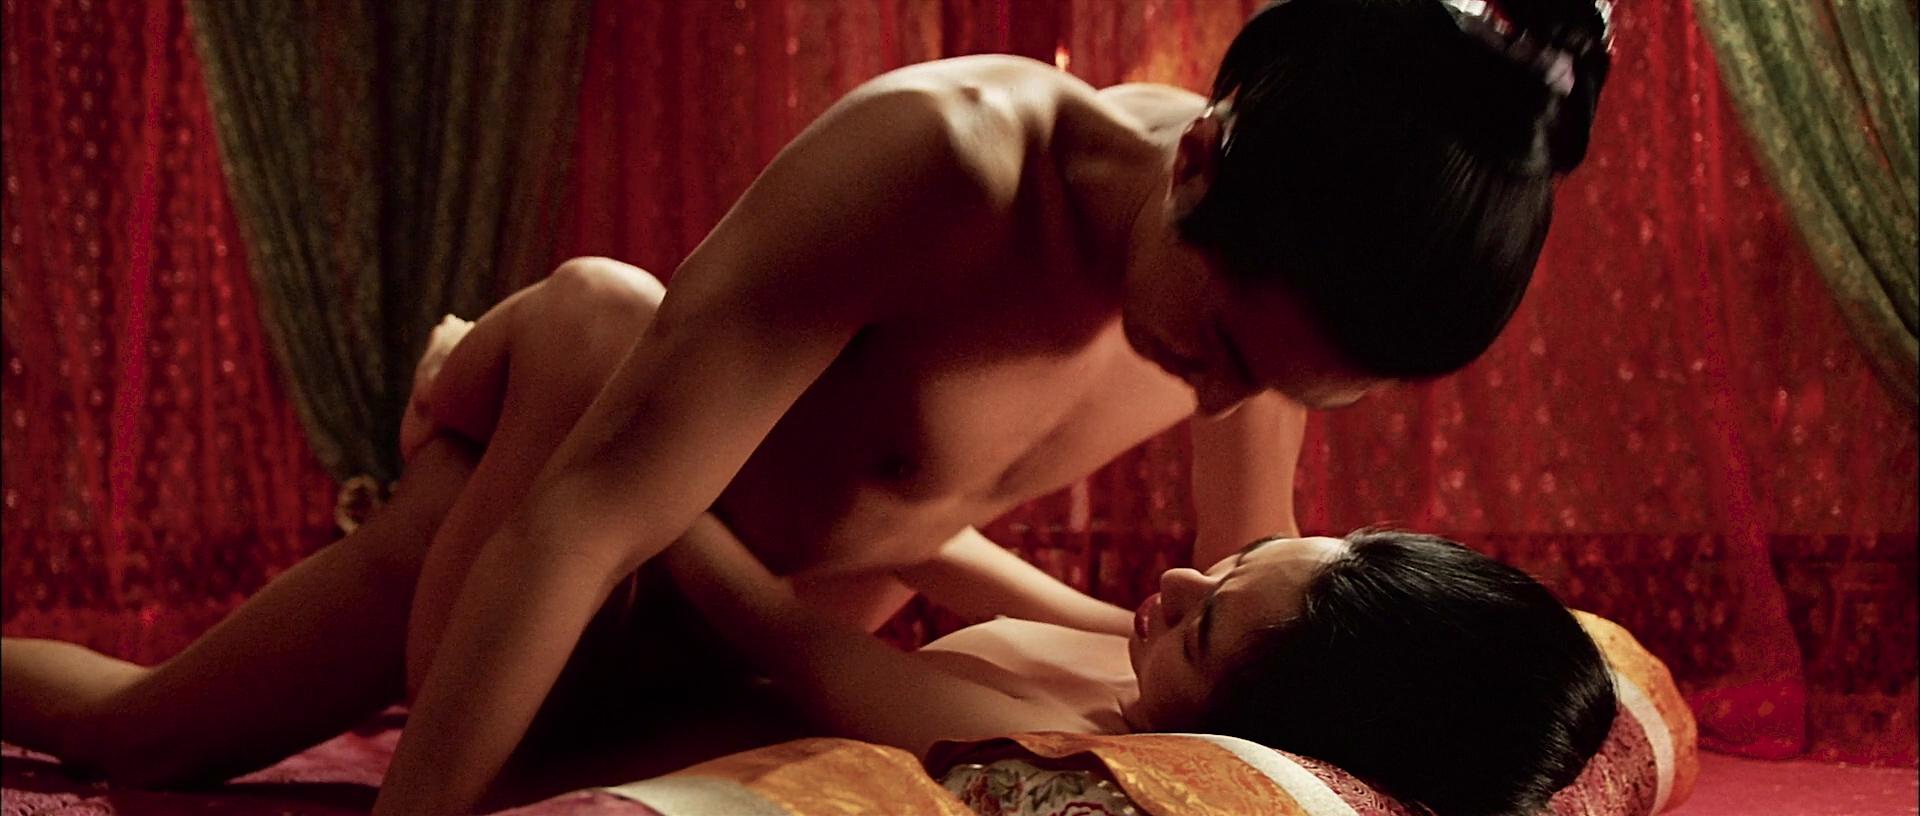 Ji-hyo Song nude topless butt and lot of hot sex - A Frozen Flower (KR-2008) HD 1080p BluRay (3)